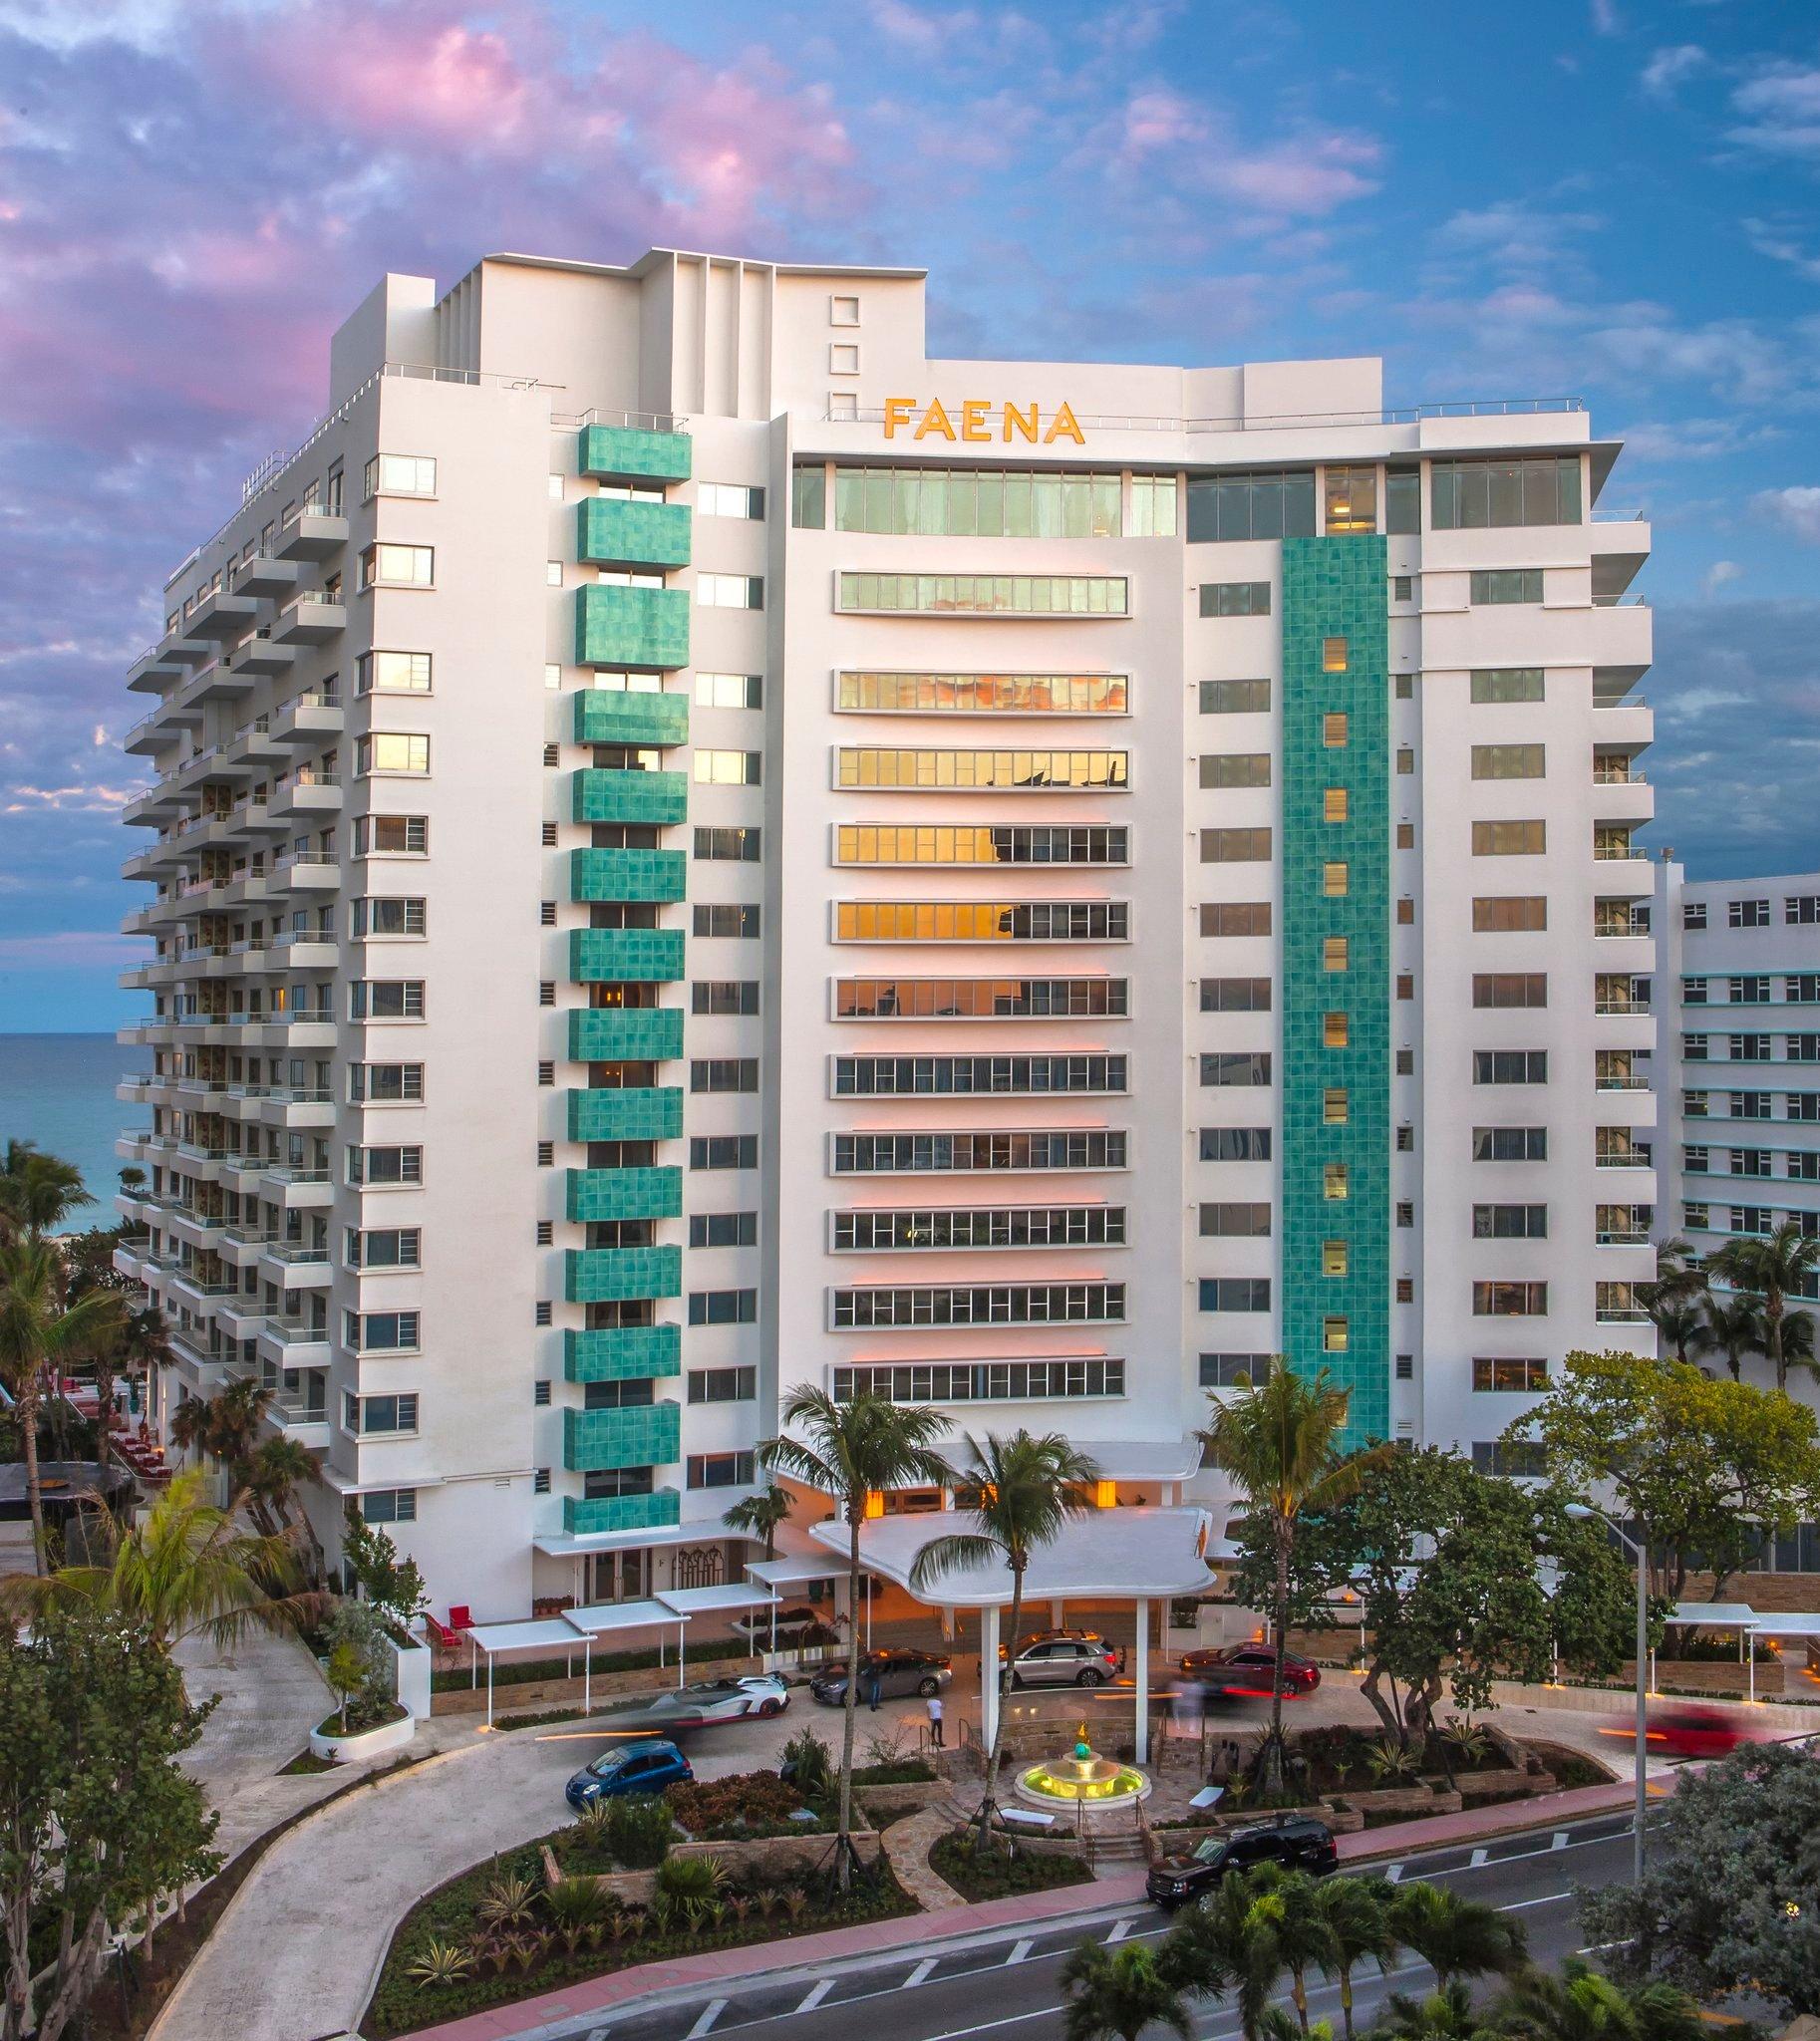 Two Bedroom Suites In Miami: Turon Travel